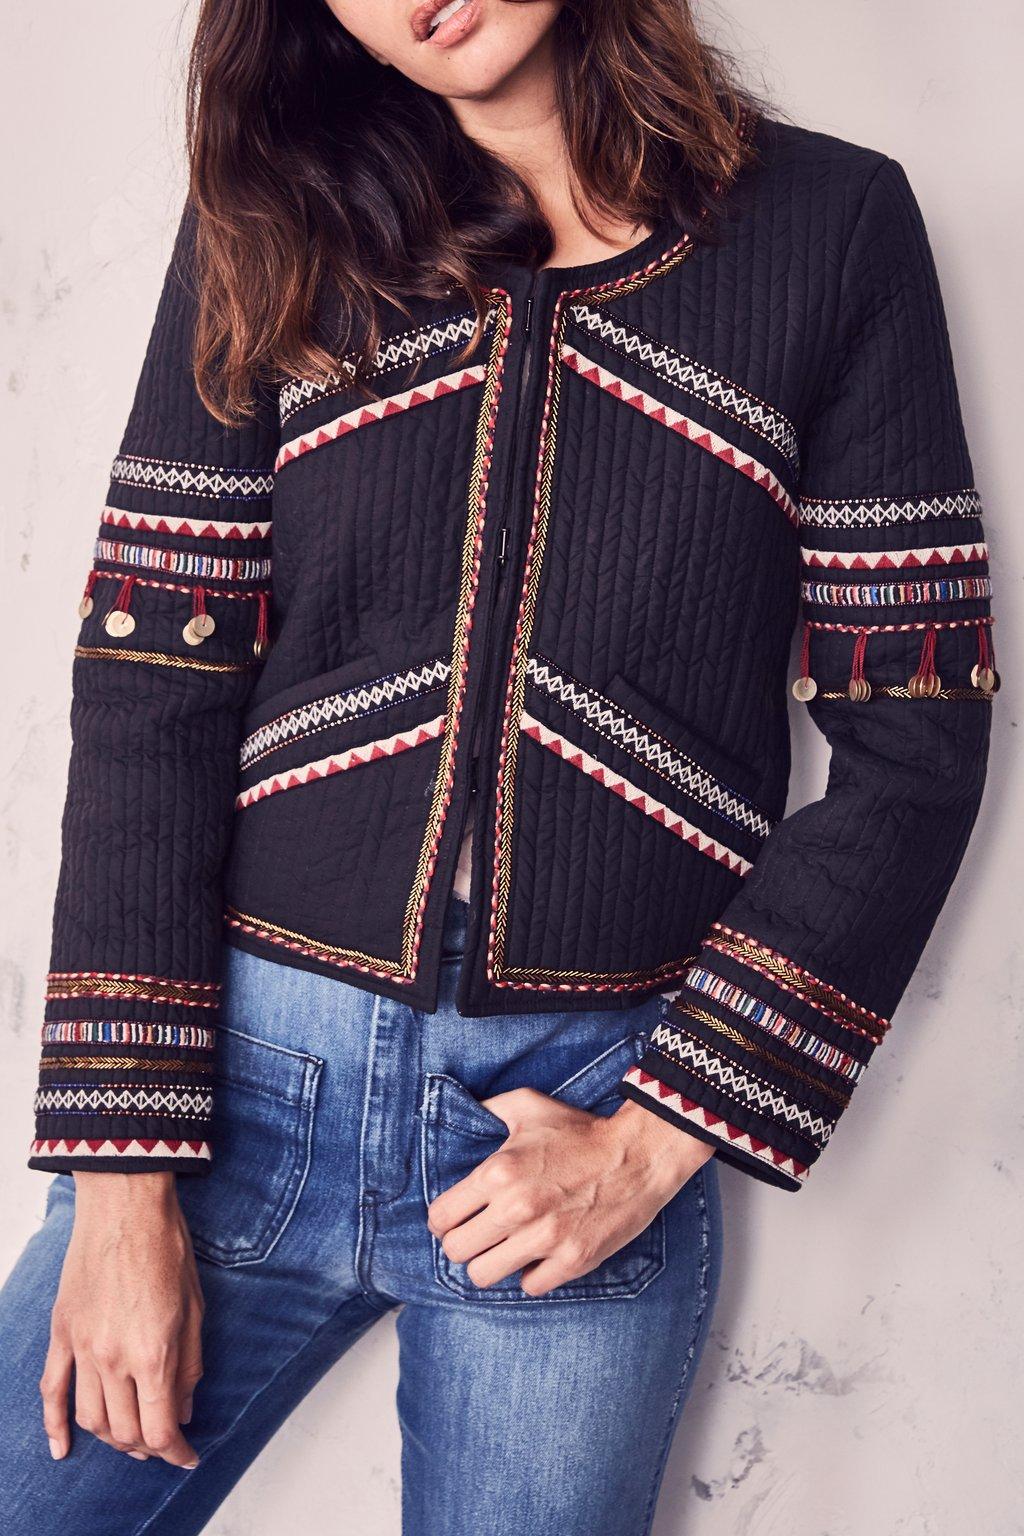 LoveShackFancy-Naya-Jacket-Fez-Embroidery-Black_1024x.jpg